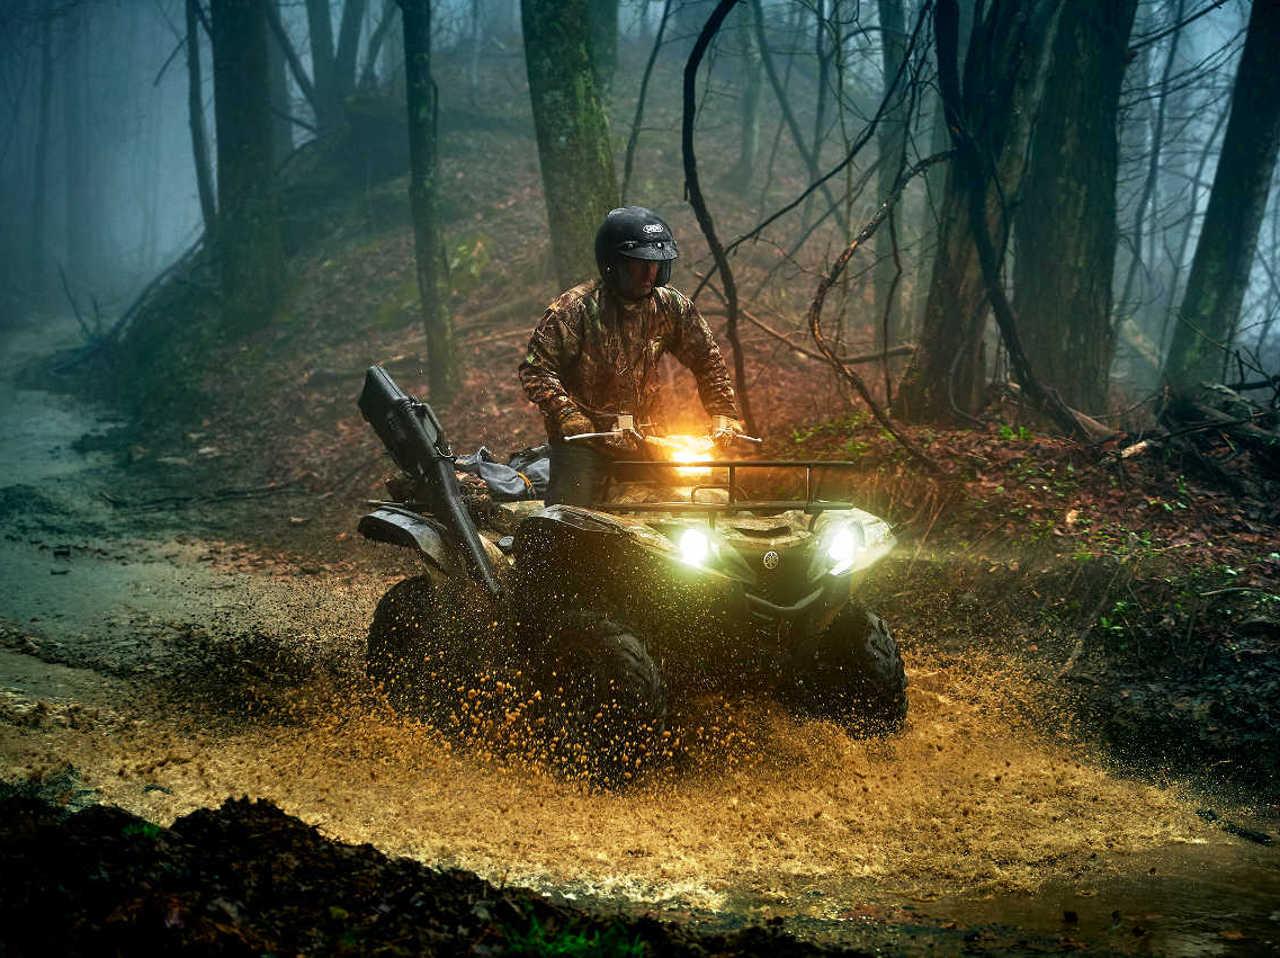 Yamaha 2015 atv line up release autos post for Yamaha grizzly 350 for sale craigslist